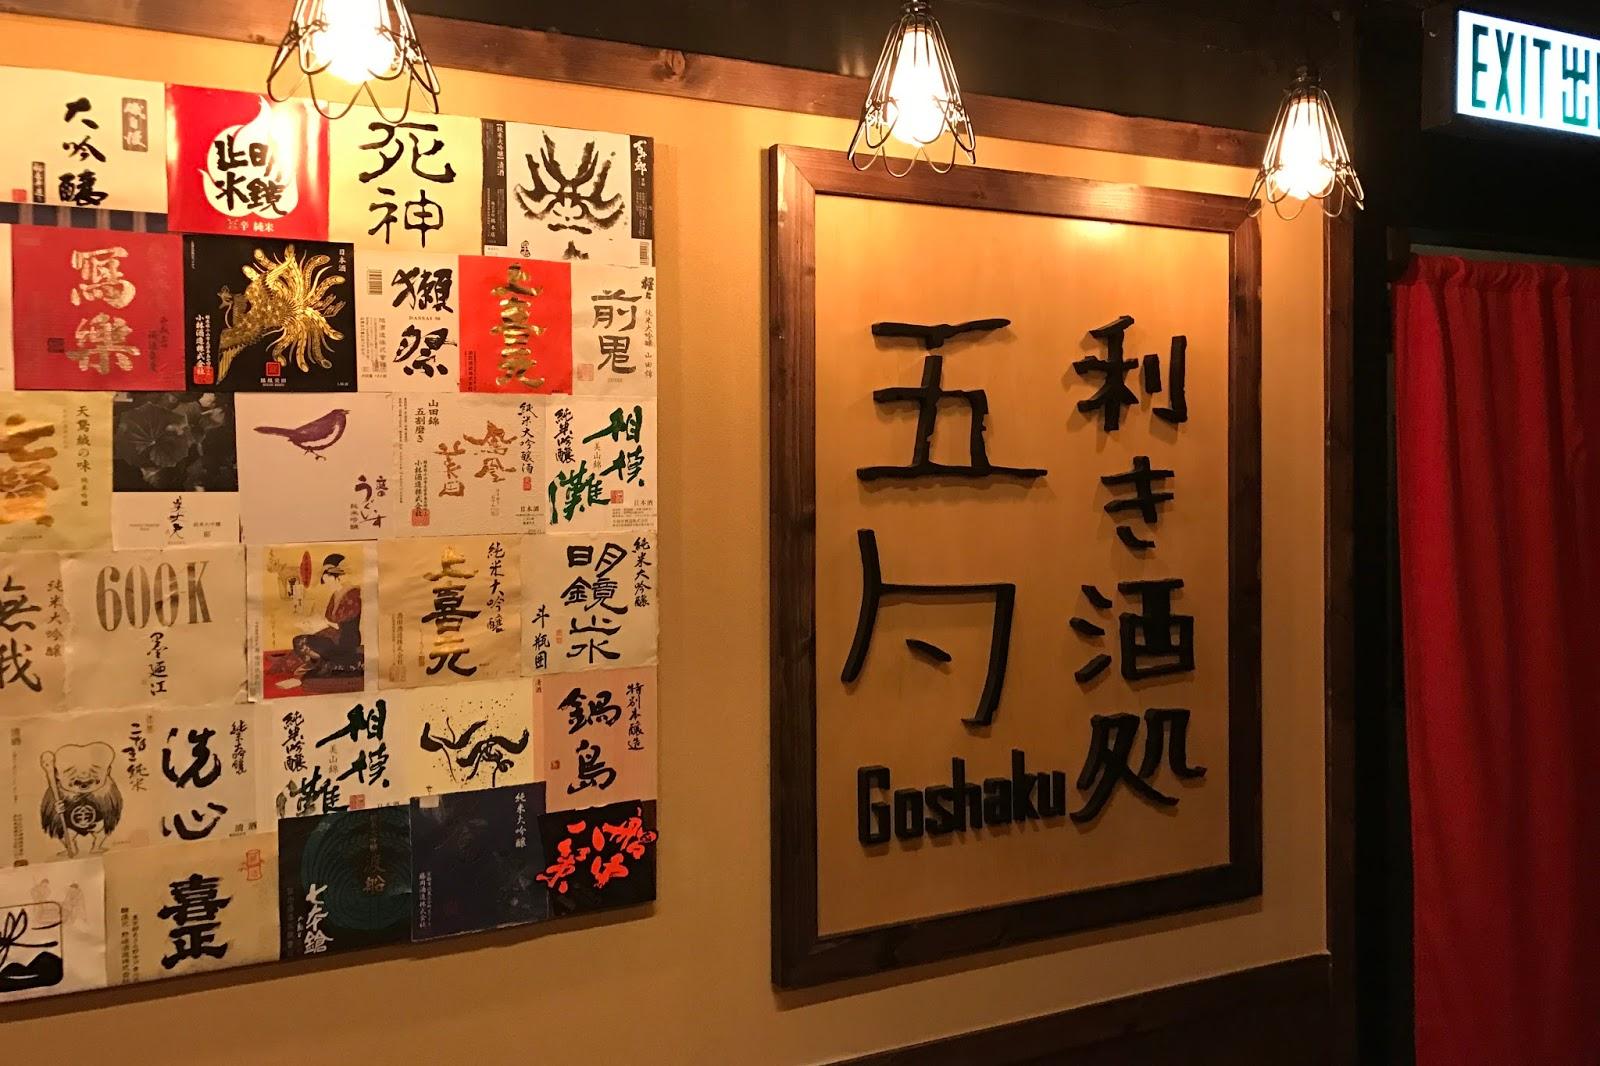 Knutsford Terrace Japanese Restaurant